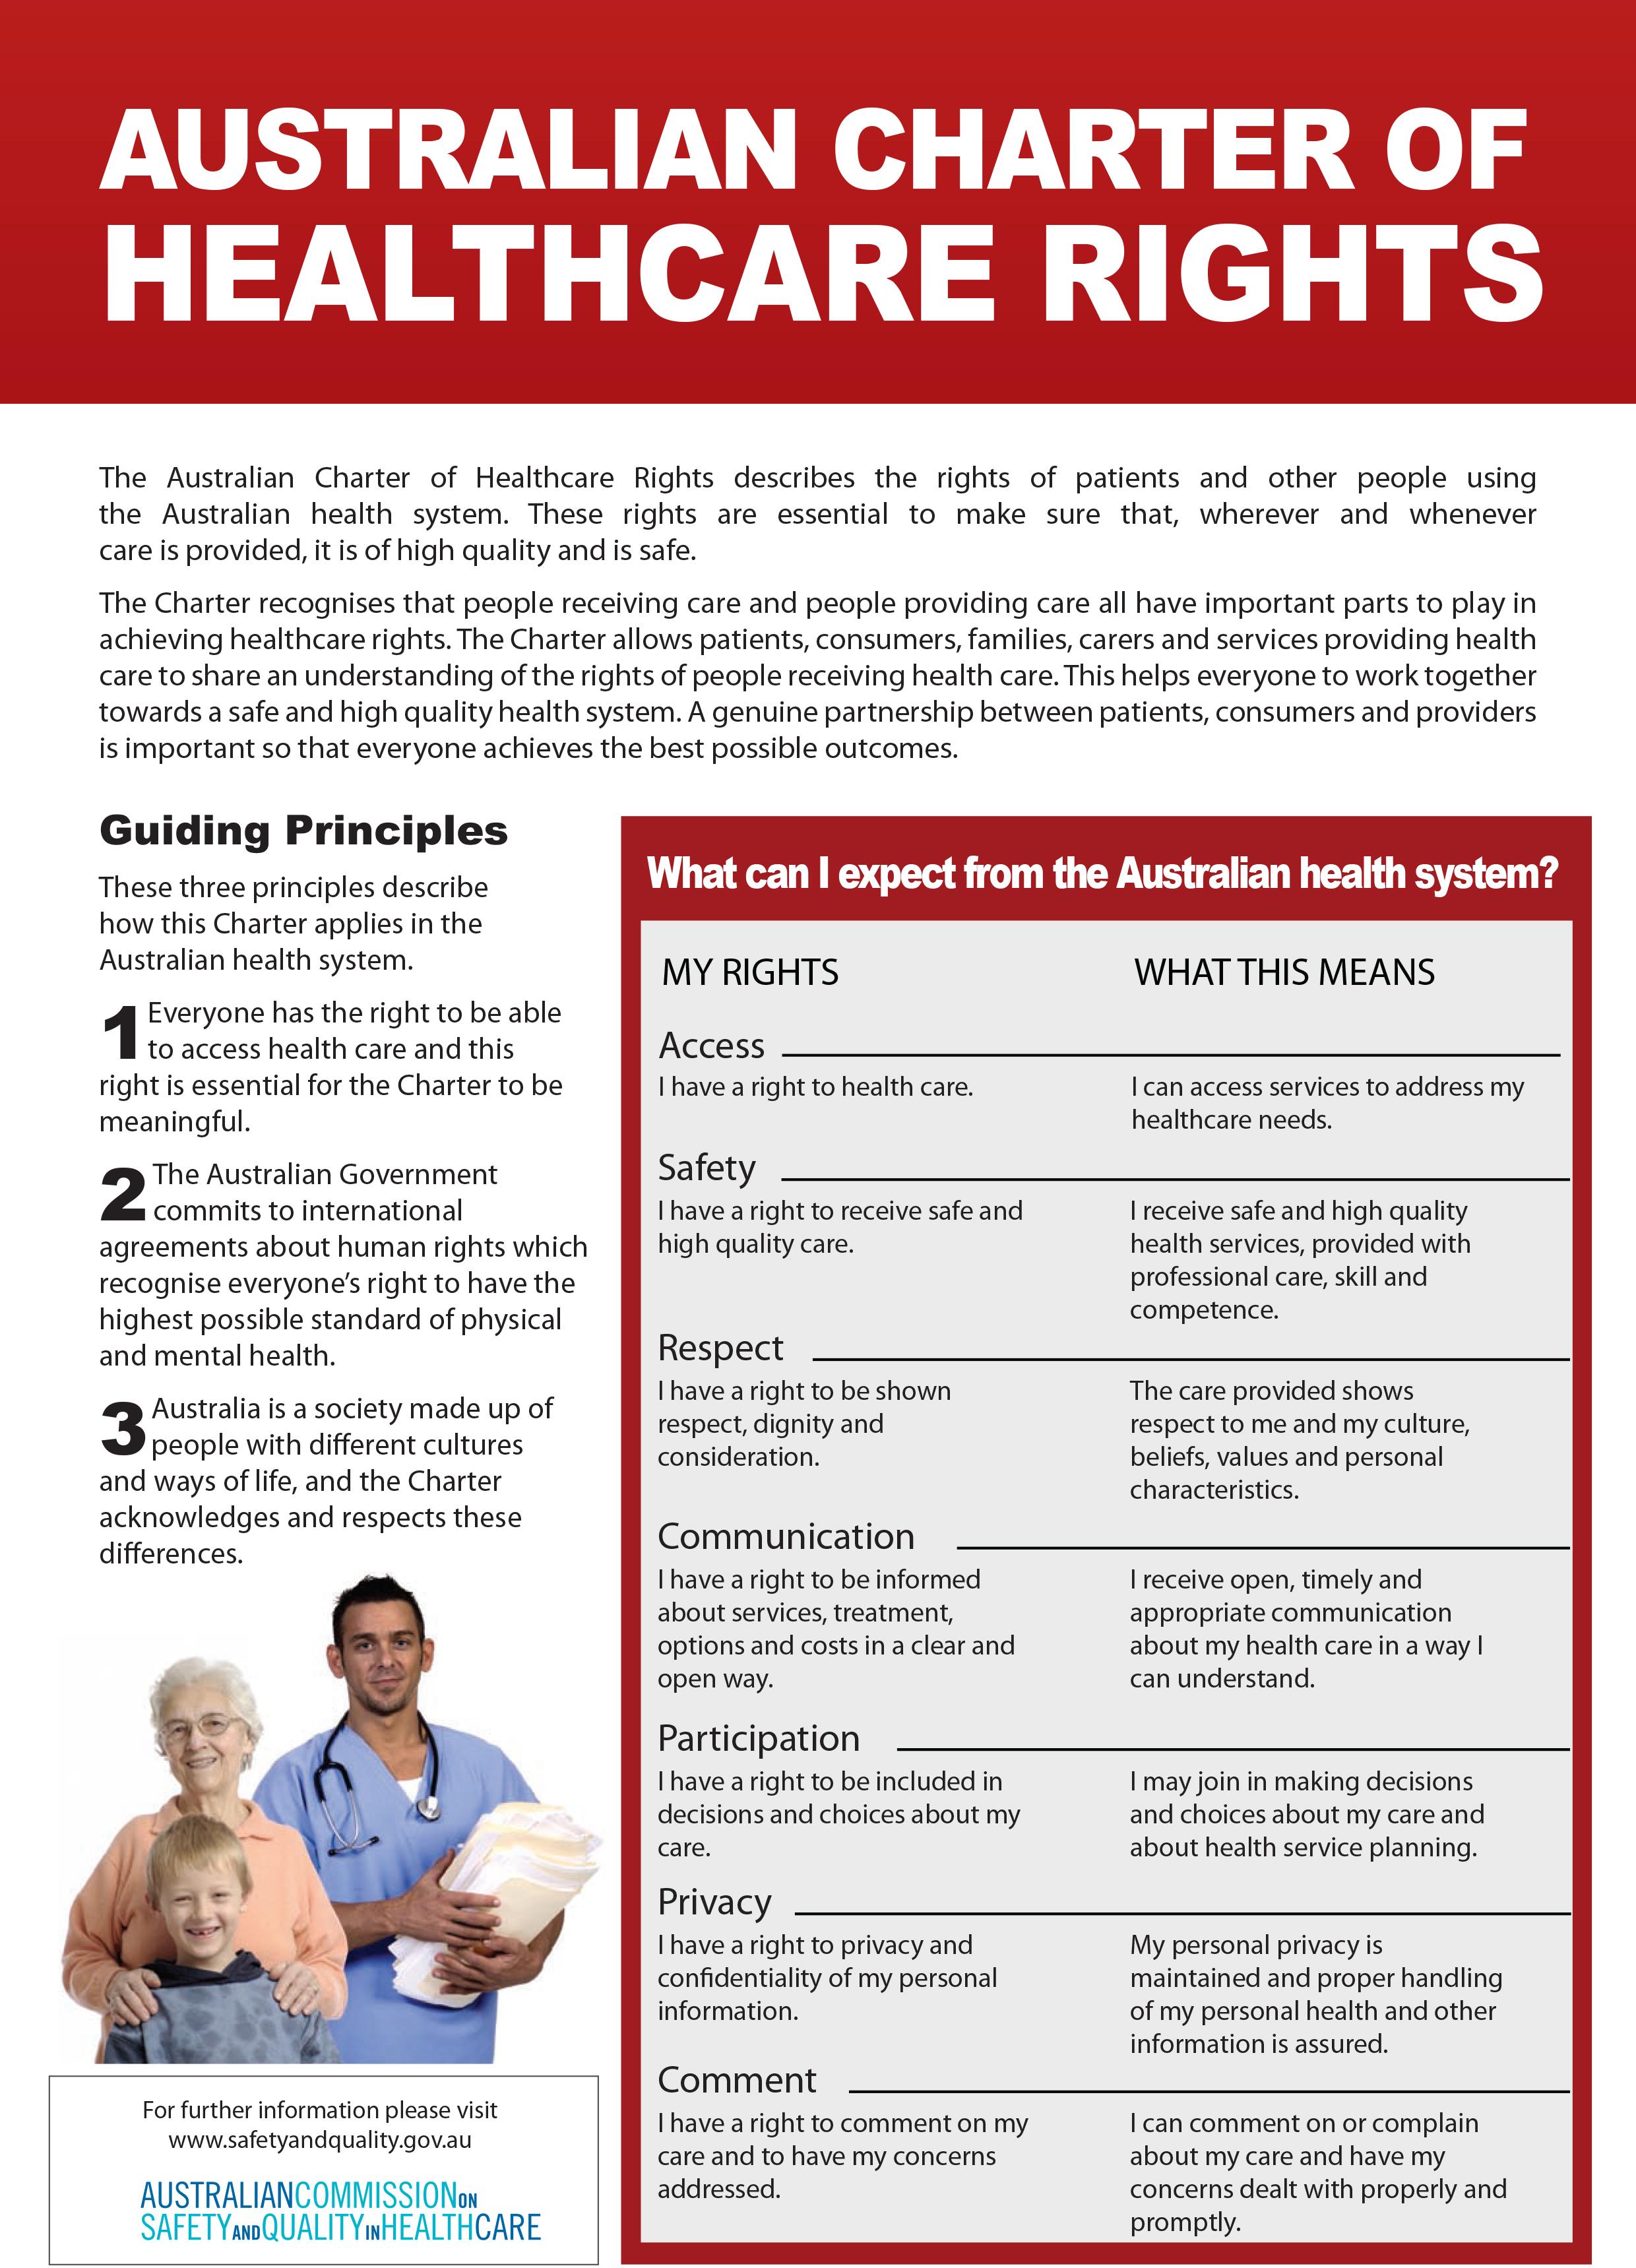 Australian Charter of Healthcare Rights - ACSQHC (2007)